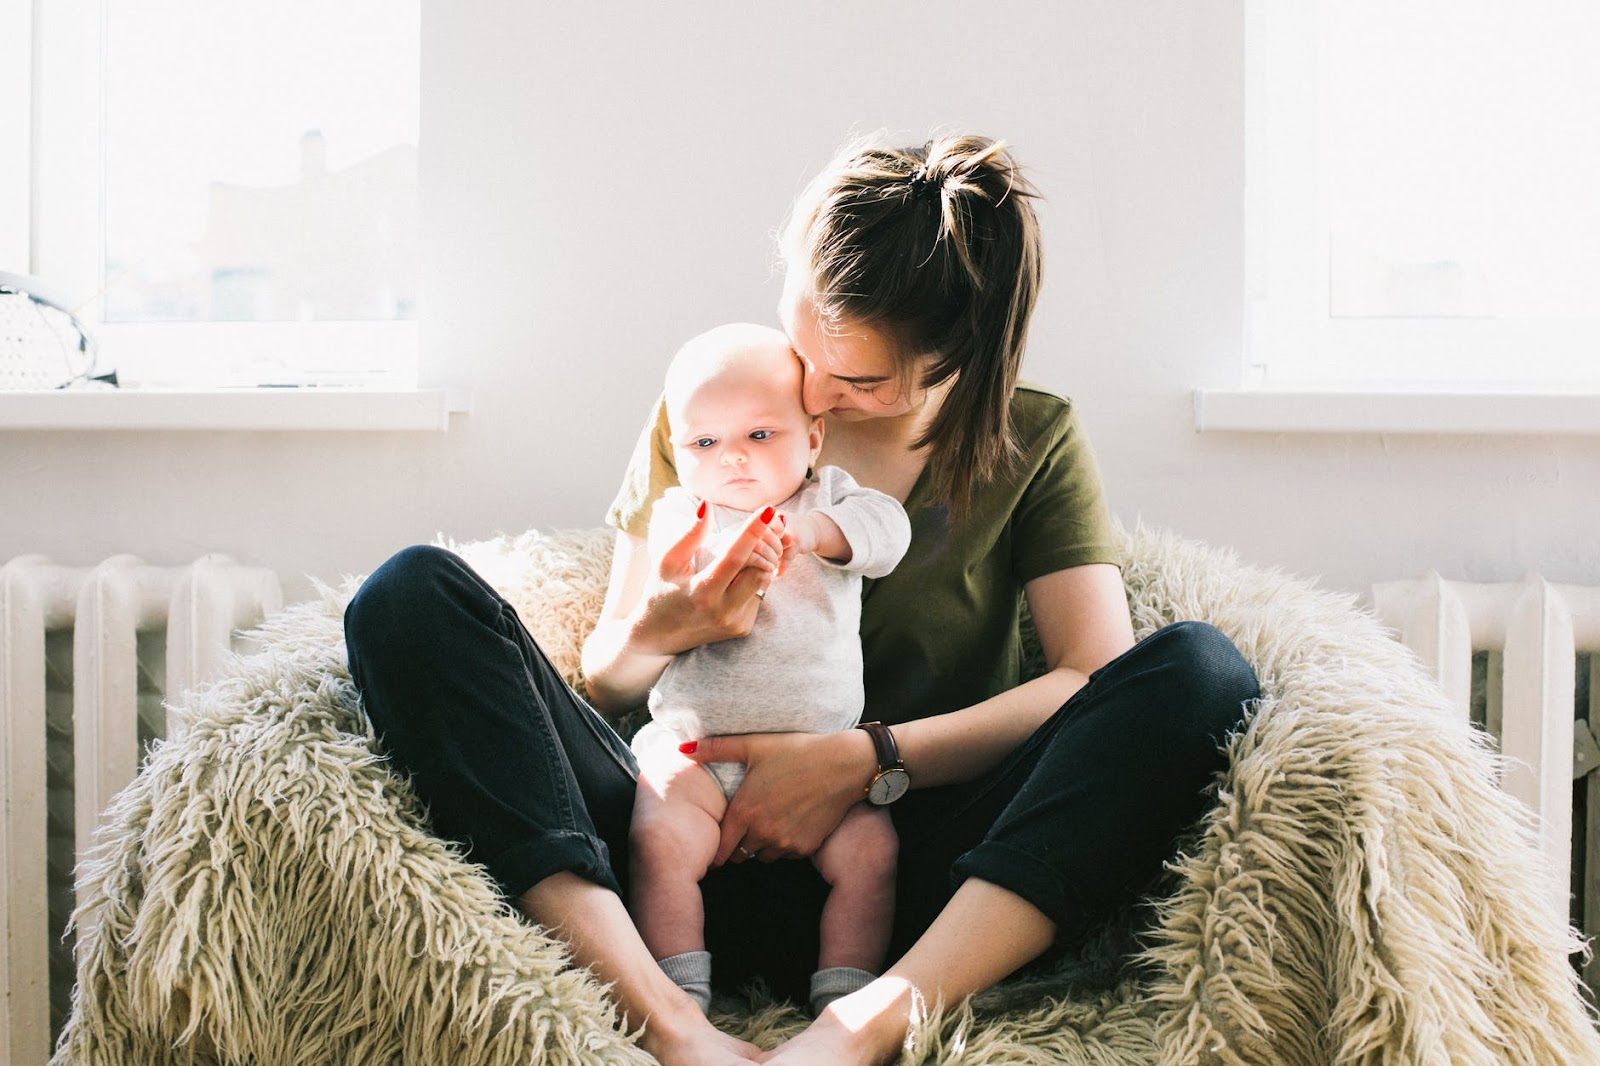 new mothers sleep-deprived